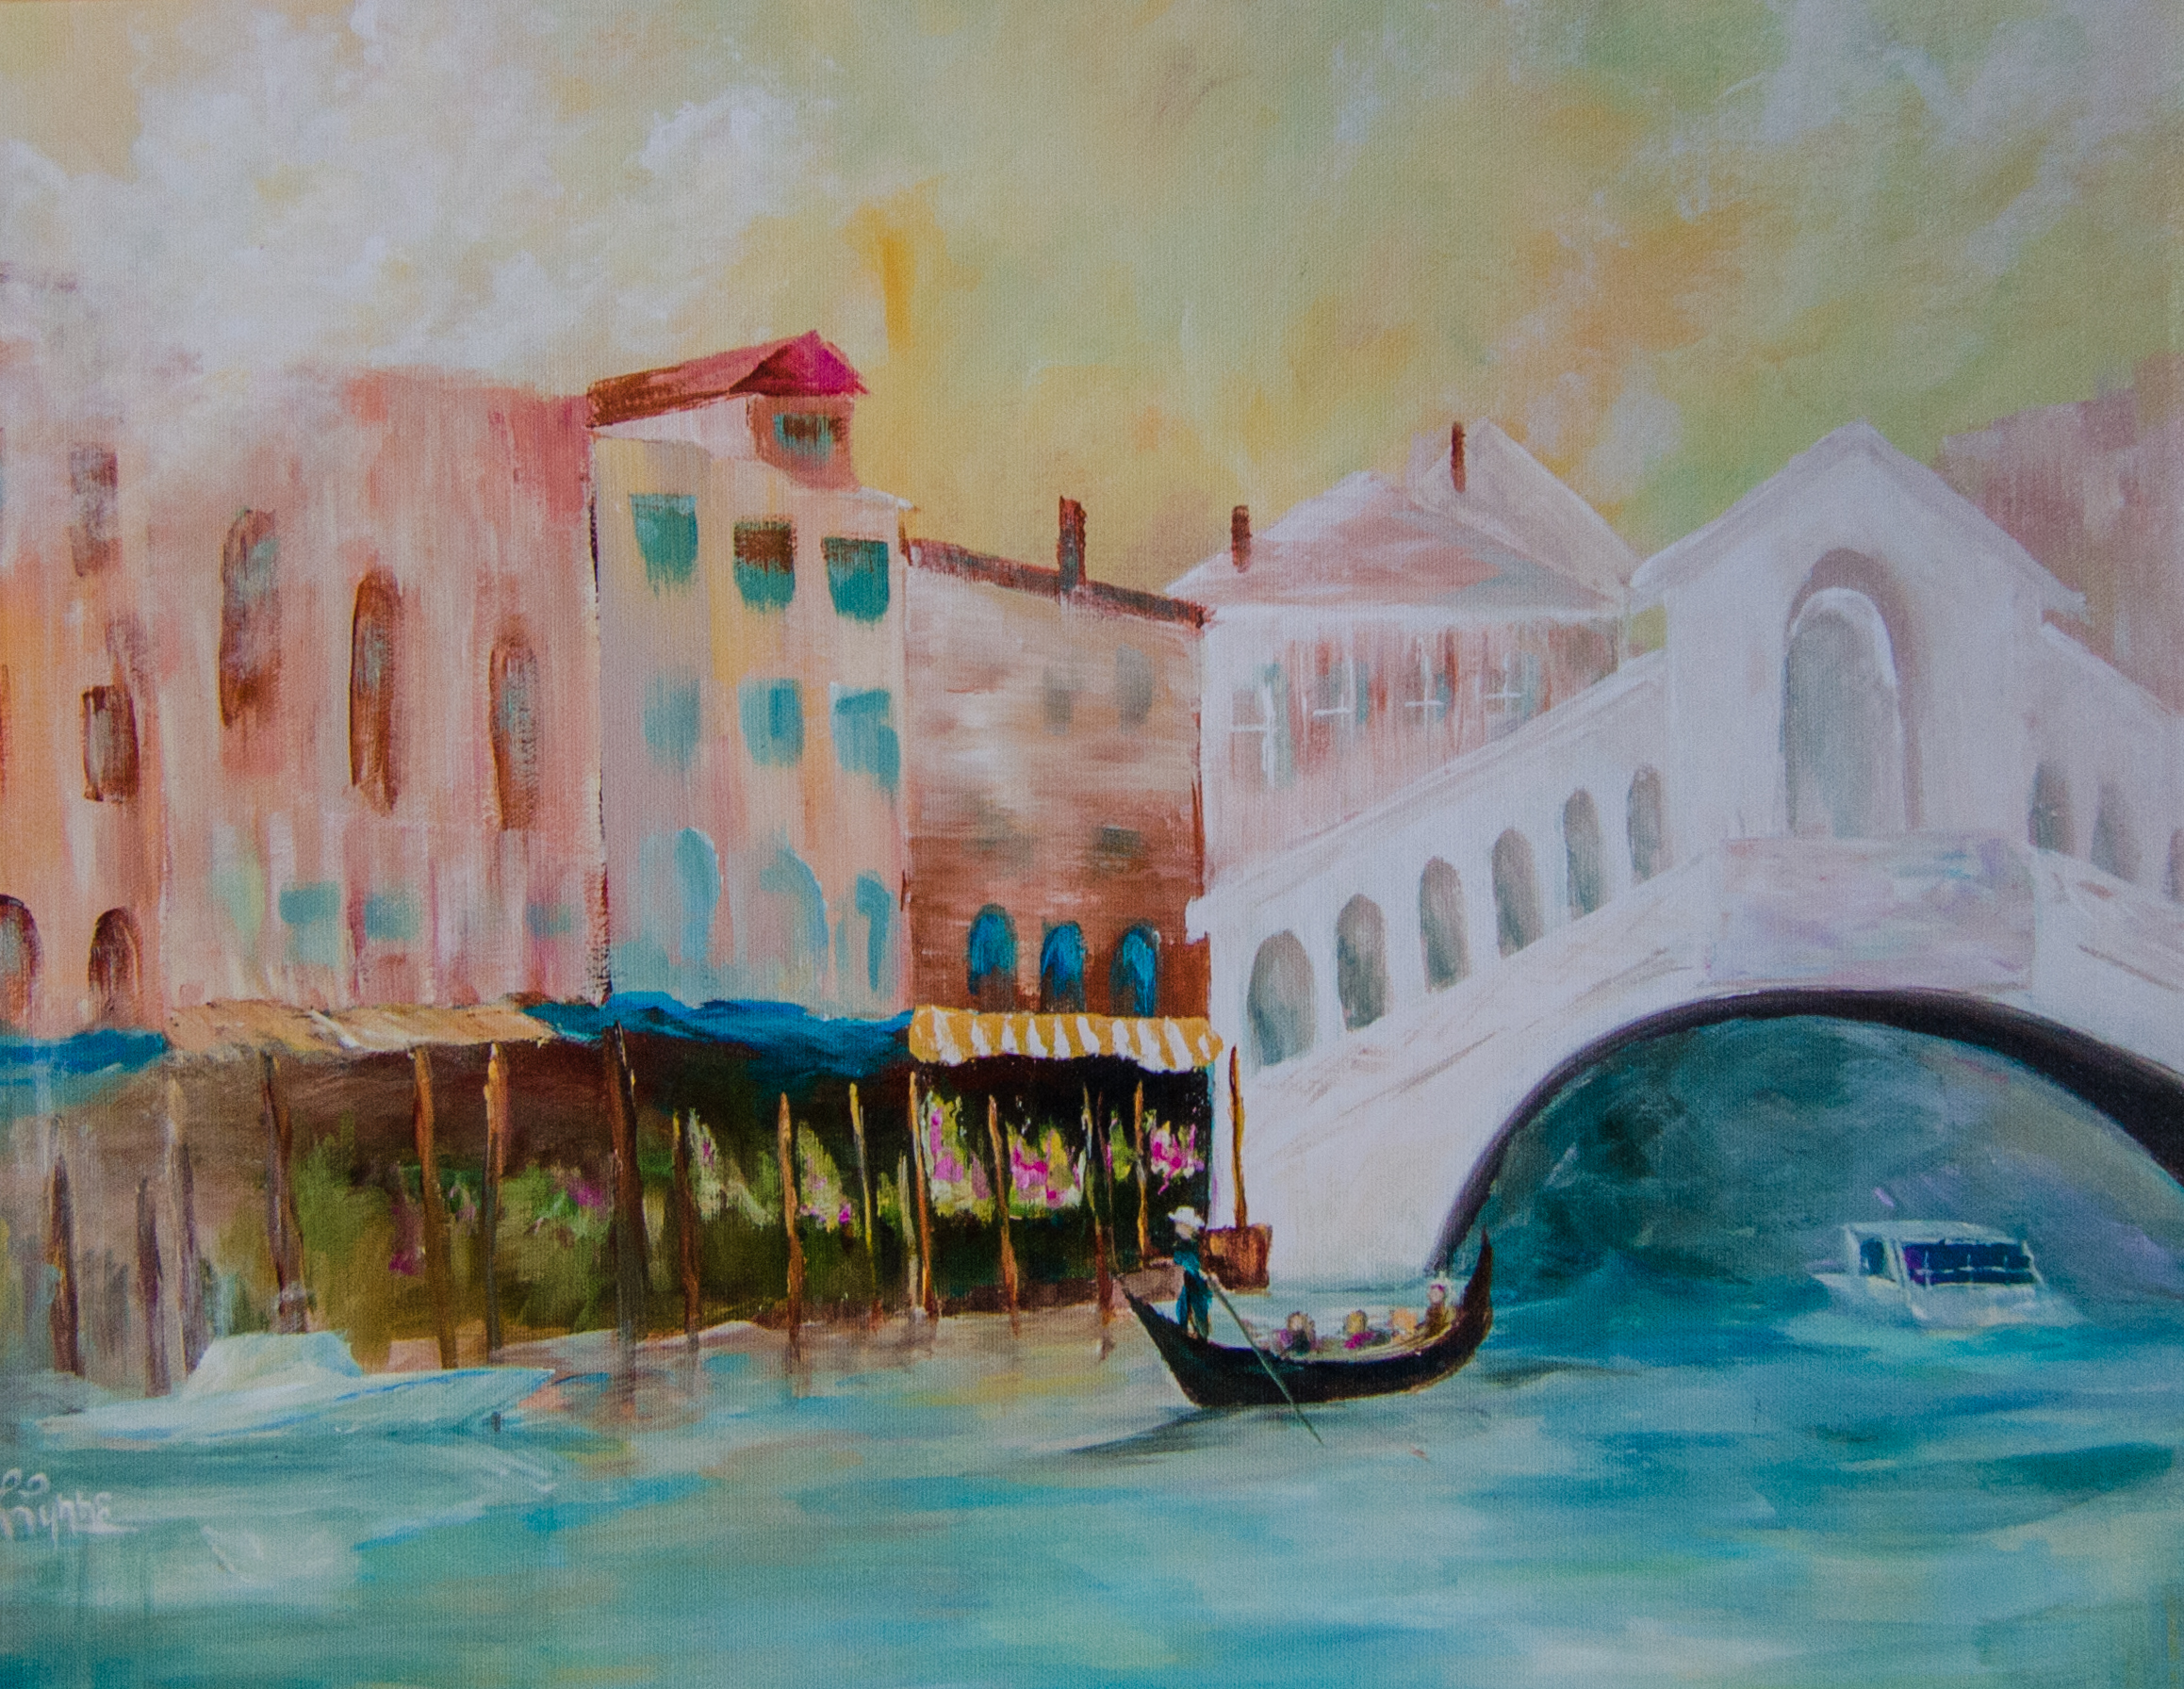 A Slice of Venice